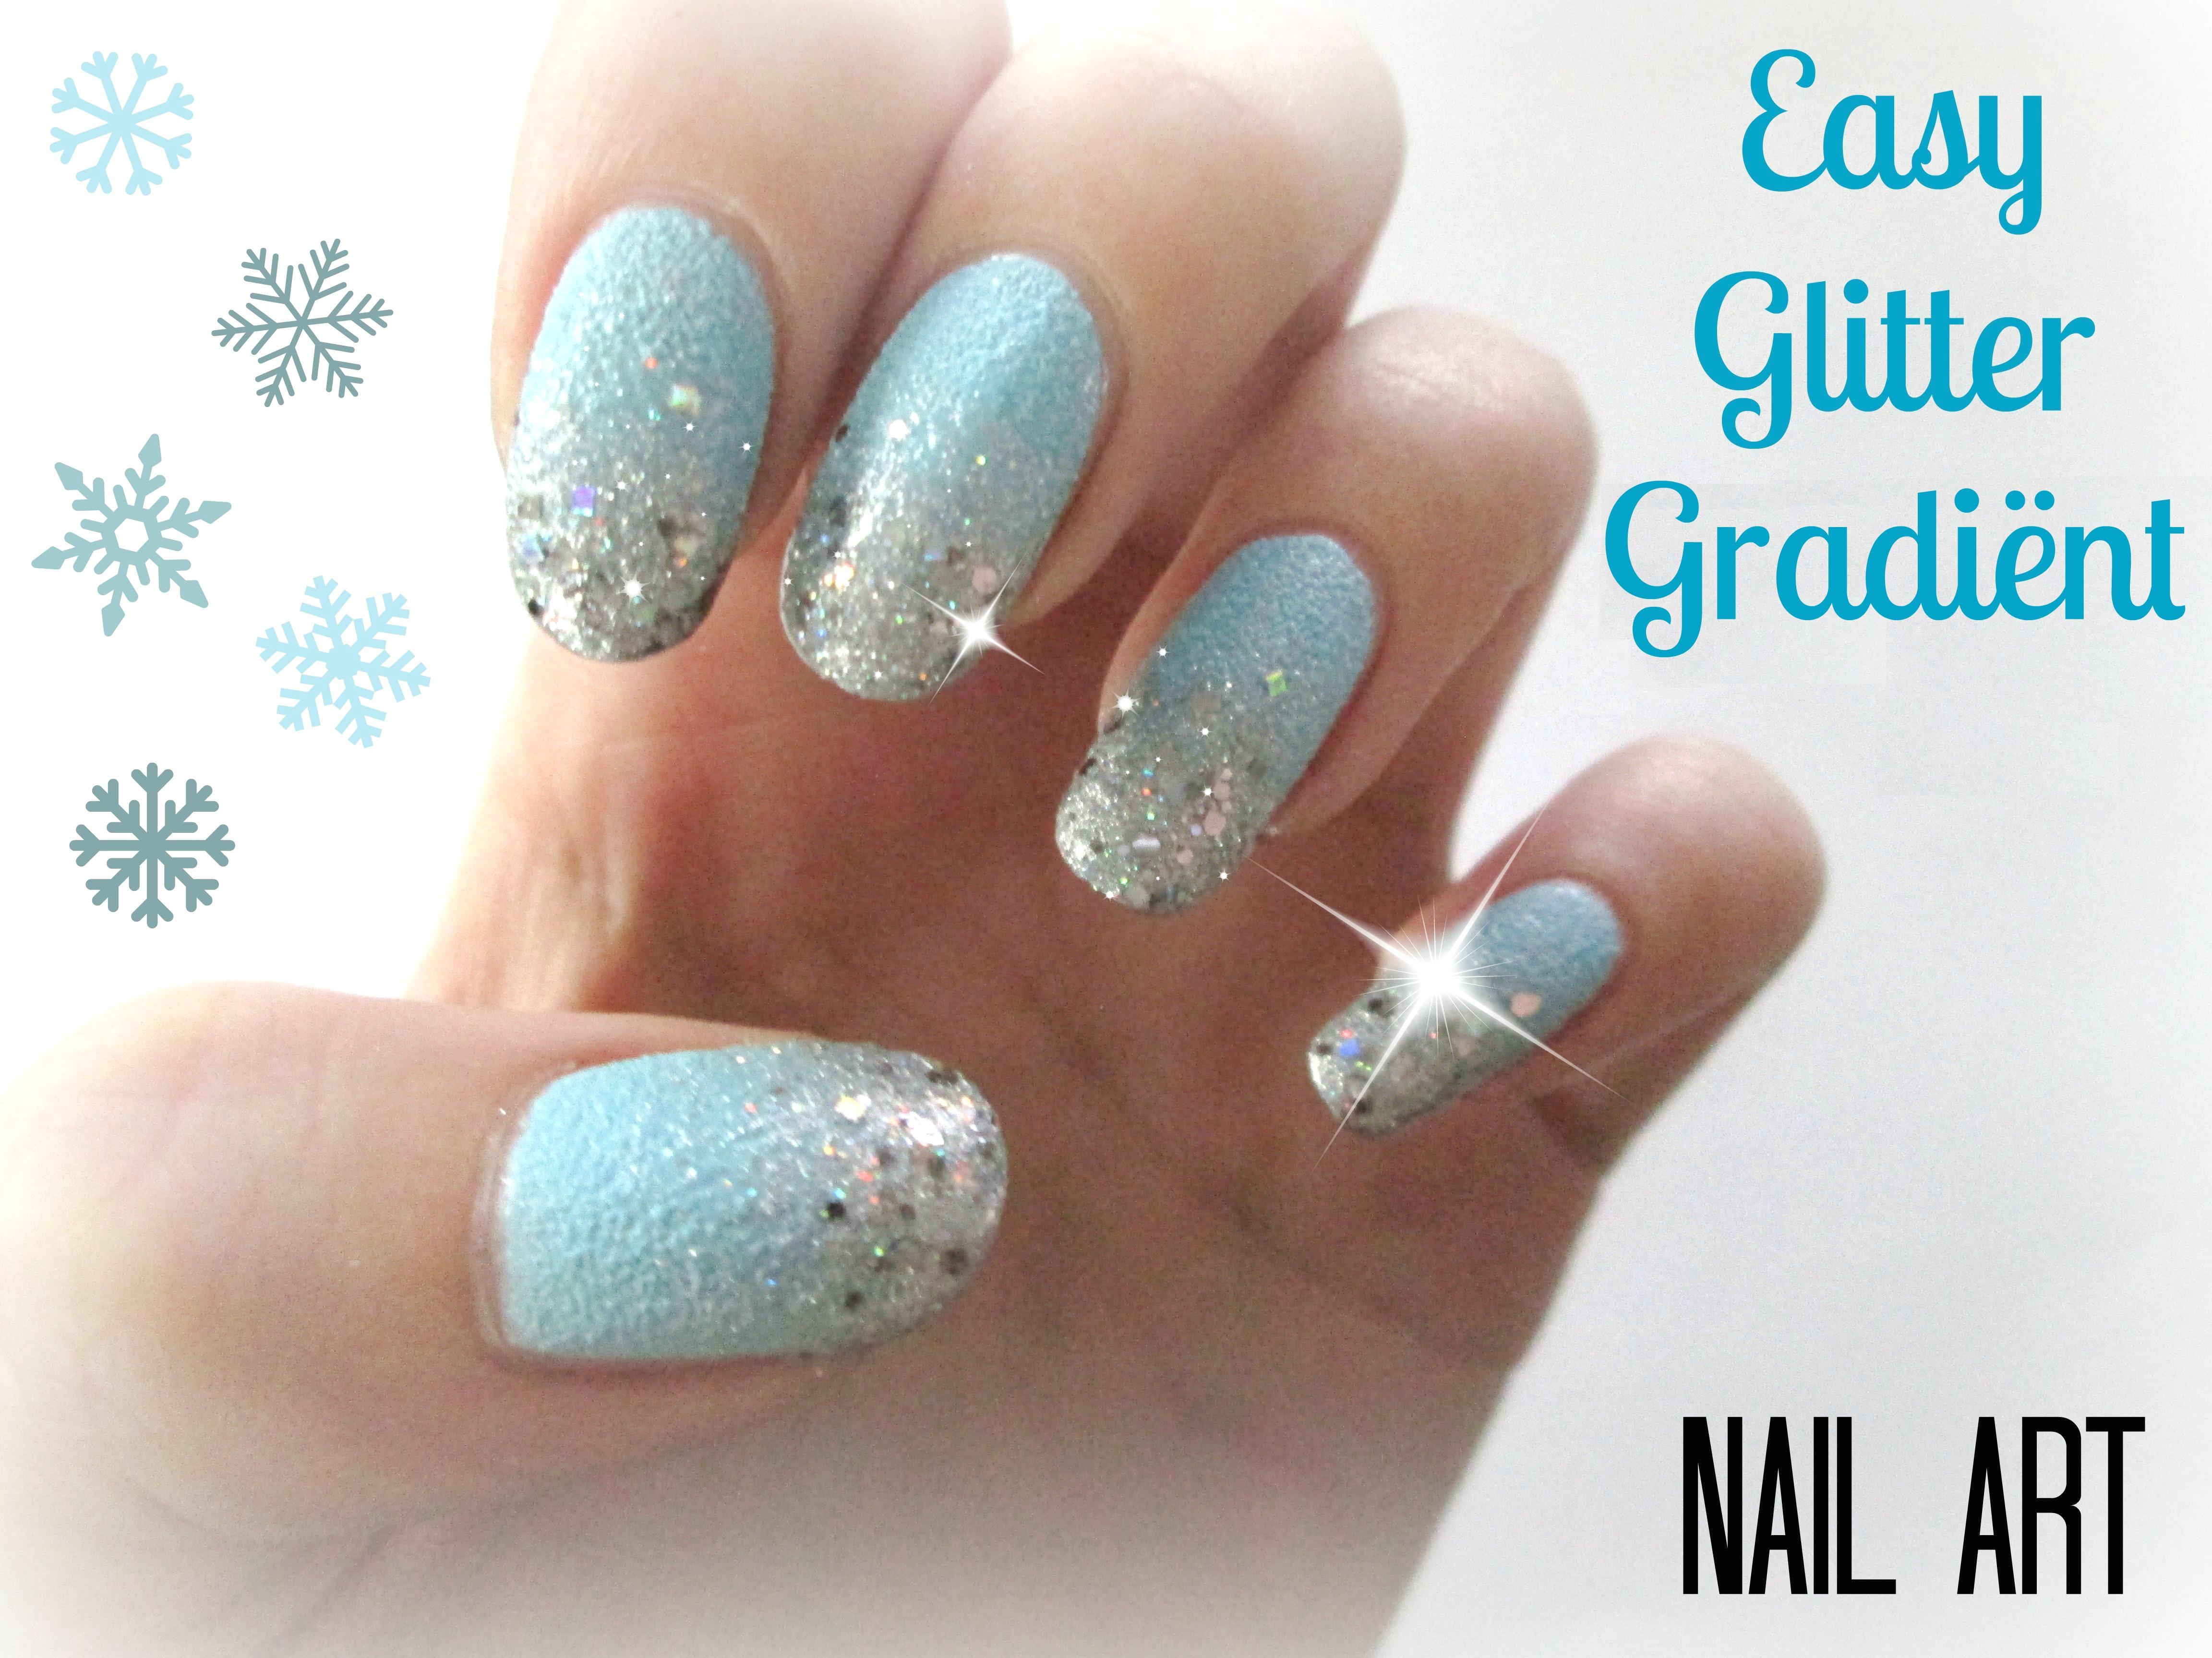 Easy Glitter Gradient Nail Art Jaudith